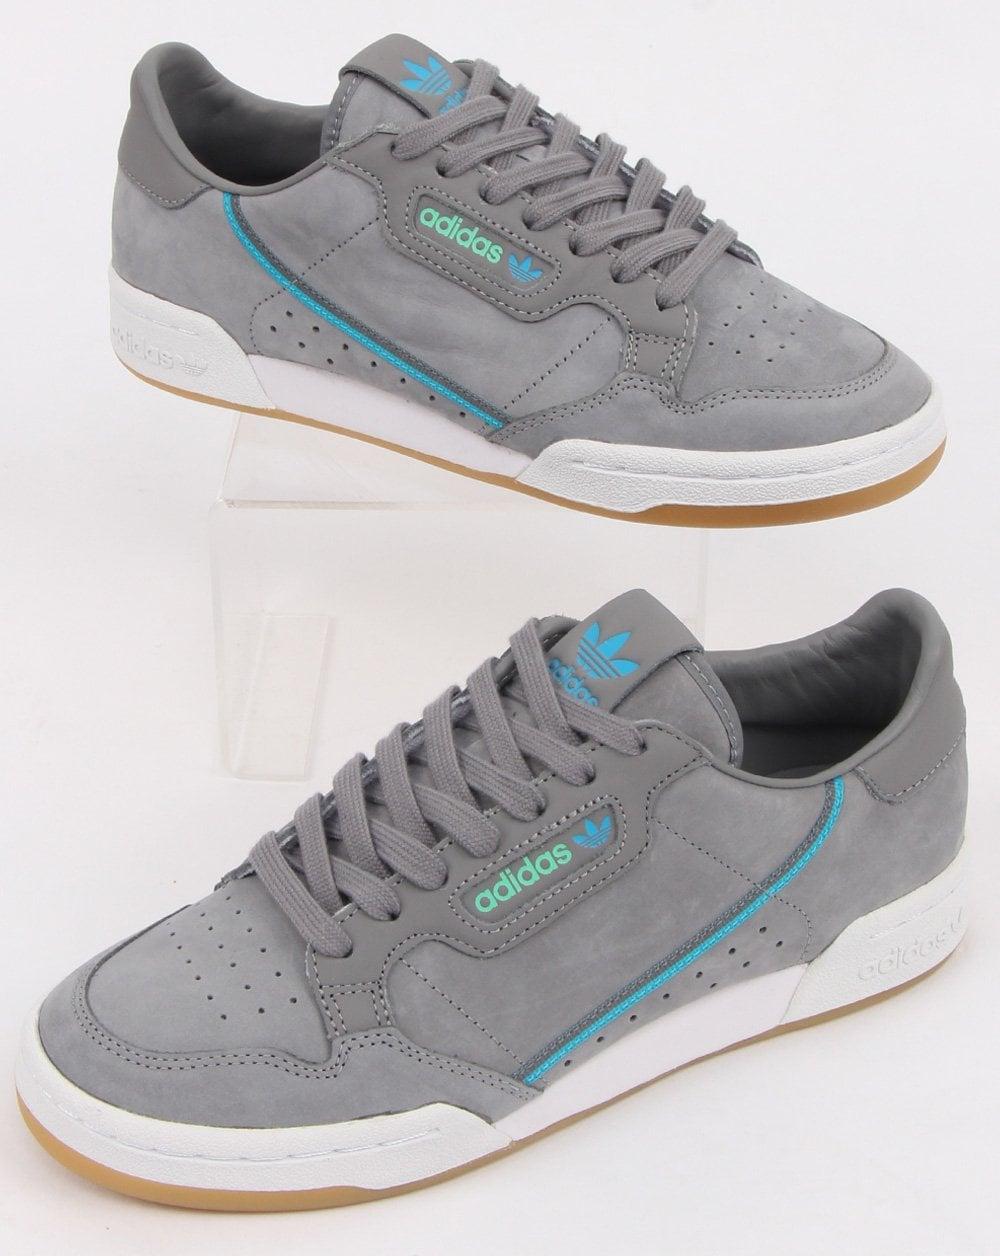 d204abba56e Adidas Continental 80 x TFL Trainers Grey/blue/green